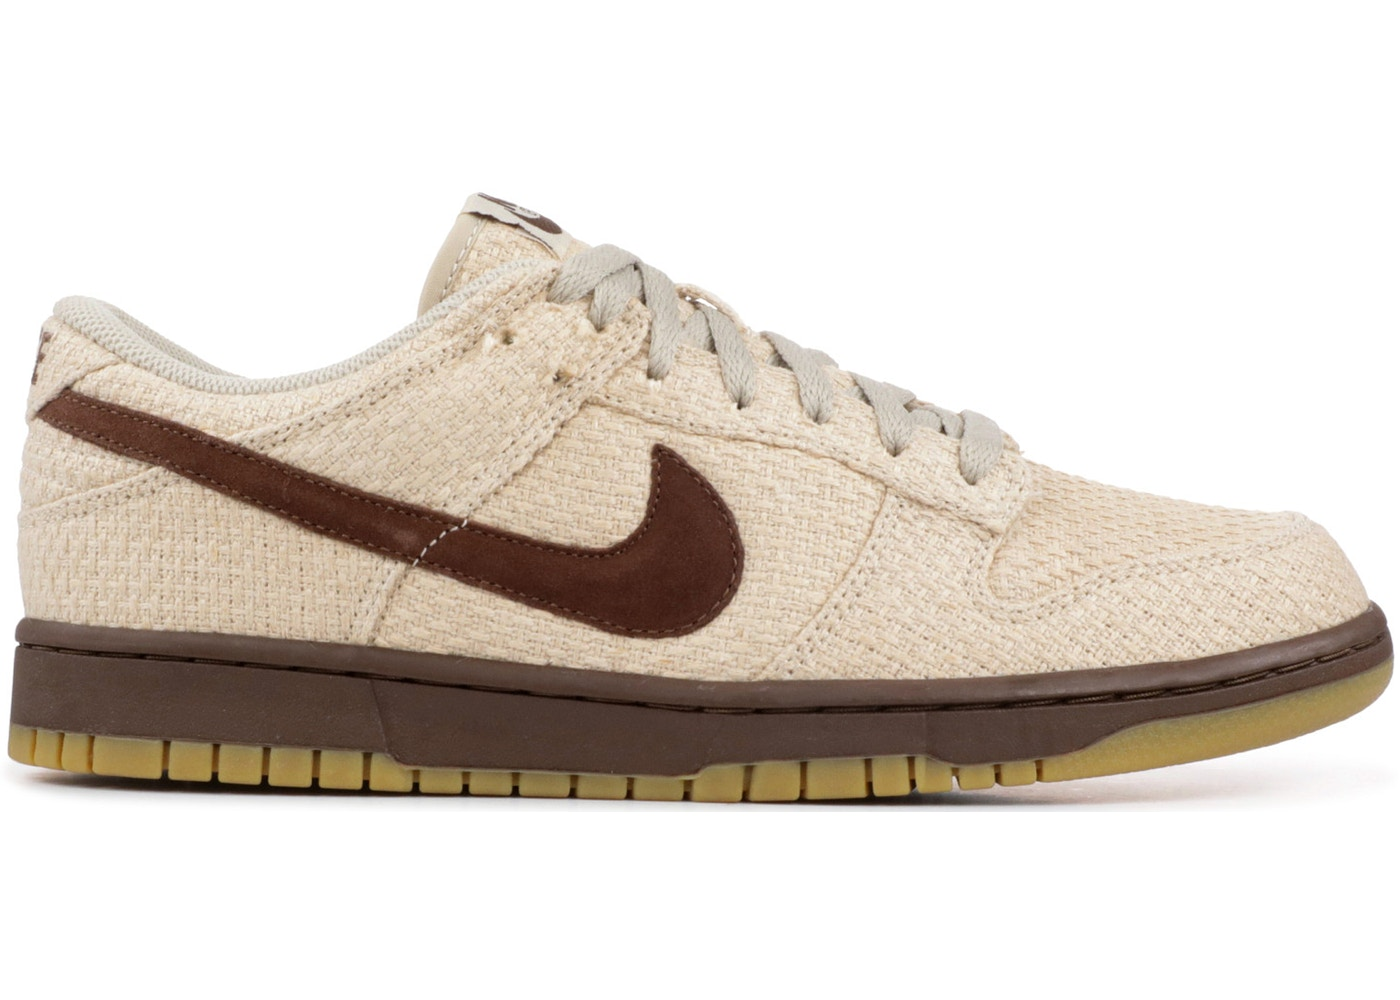 online store 90c2e fc8bd Nike Dunk Low Hemp Brown (2005) - 307696-121